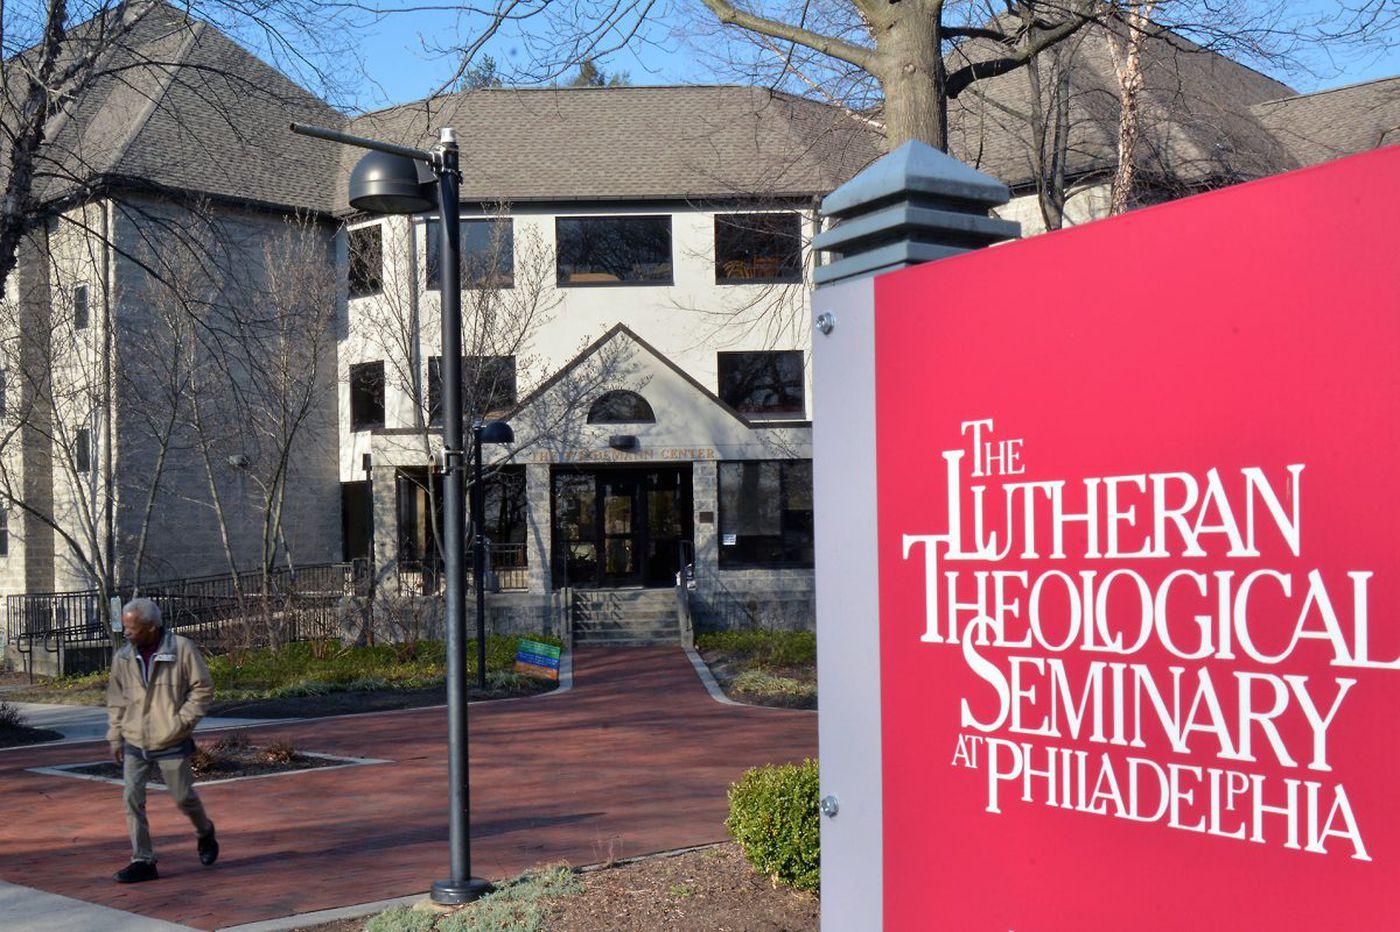 lutheran views on gays